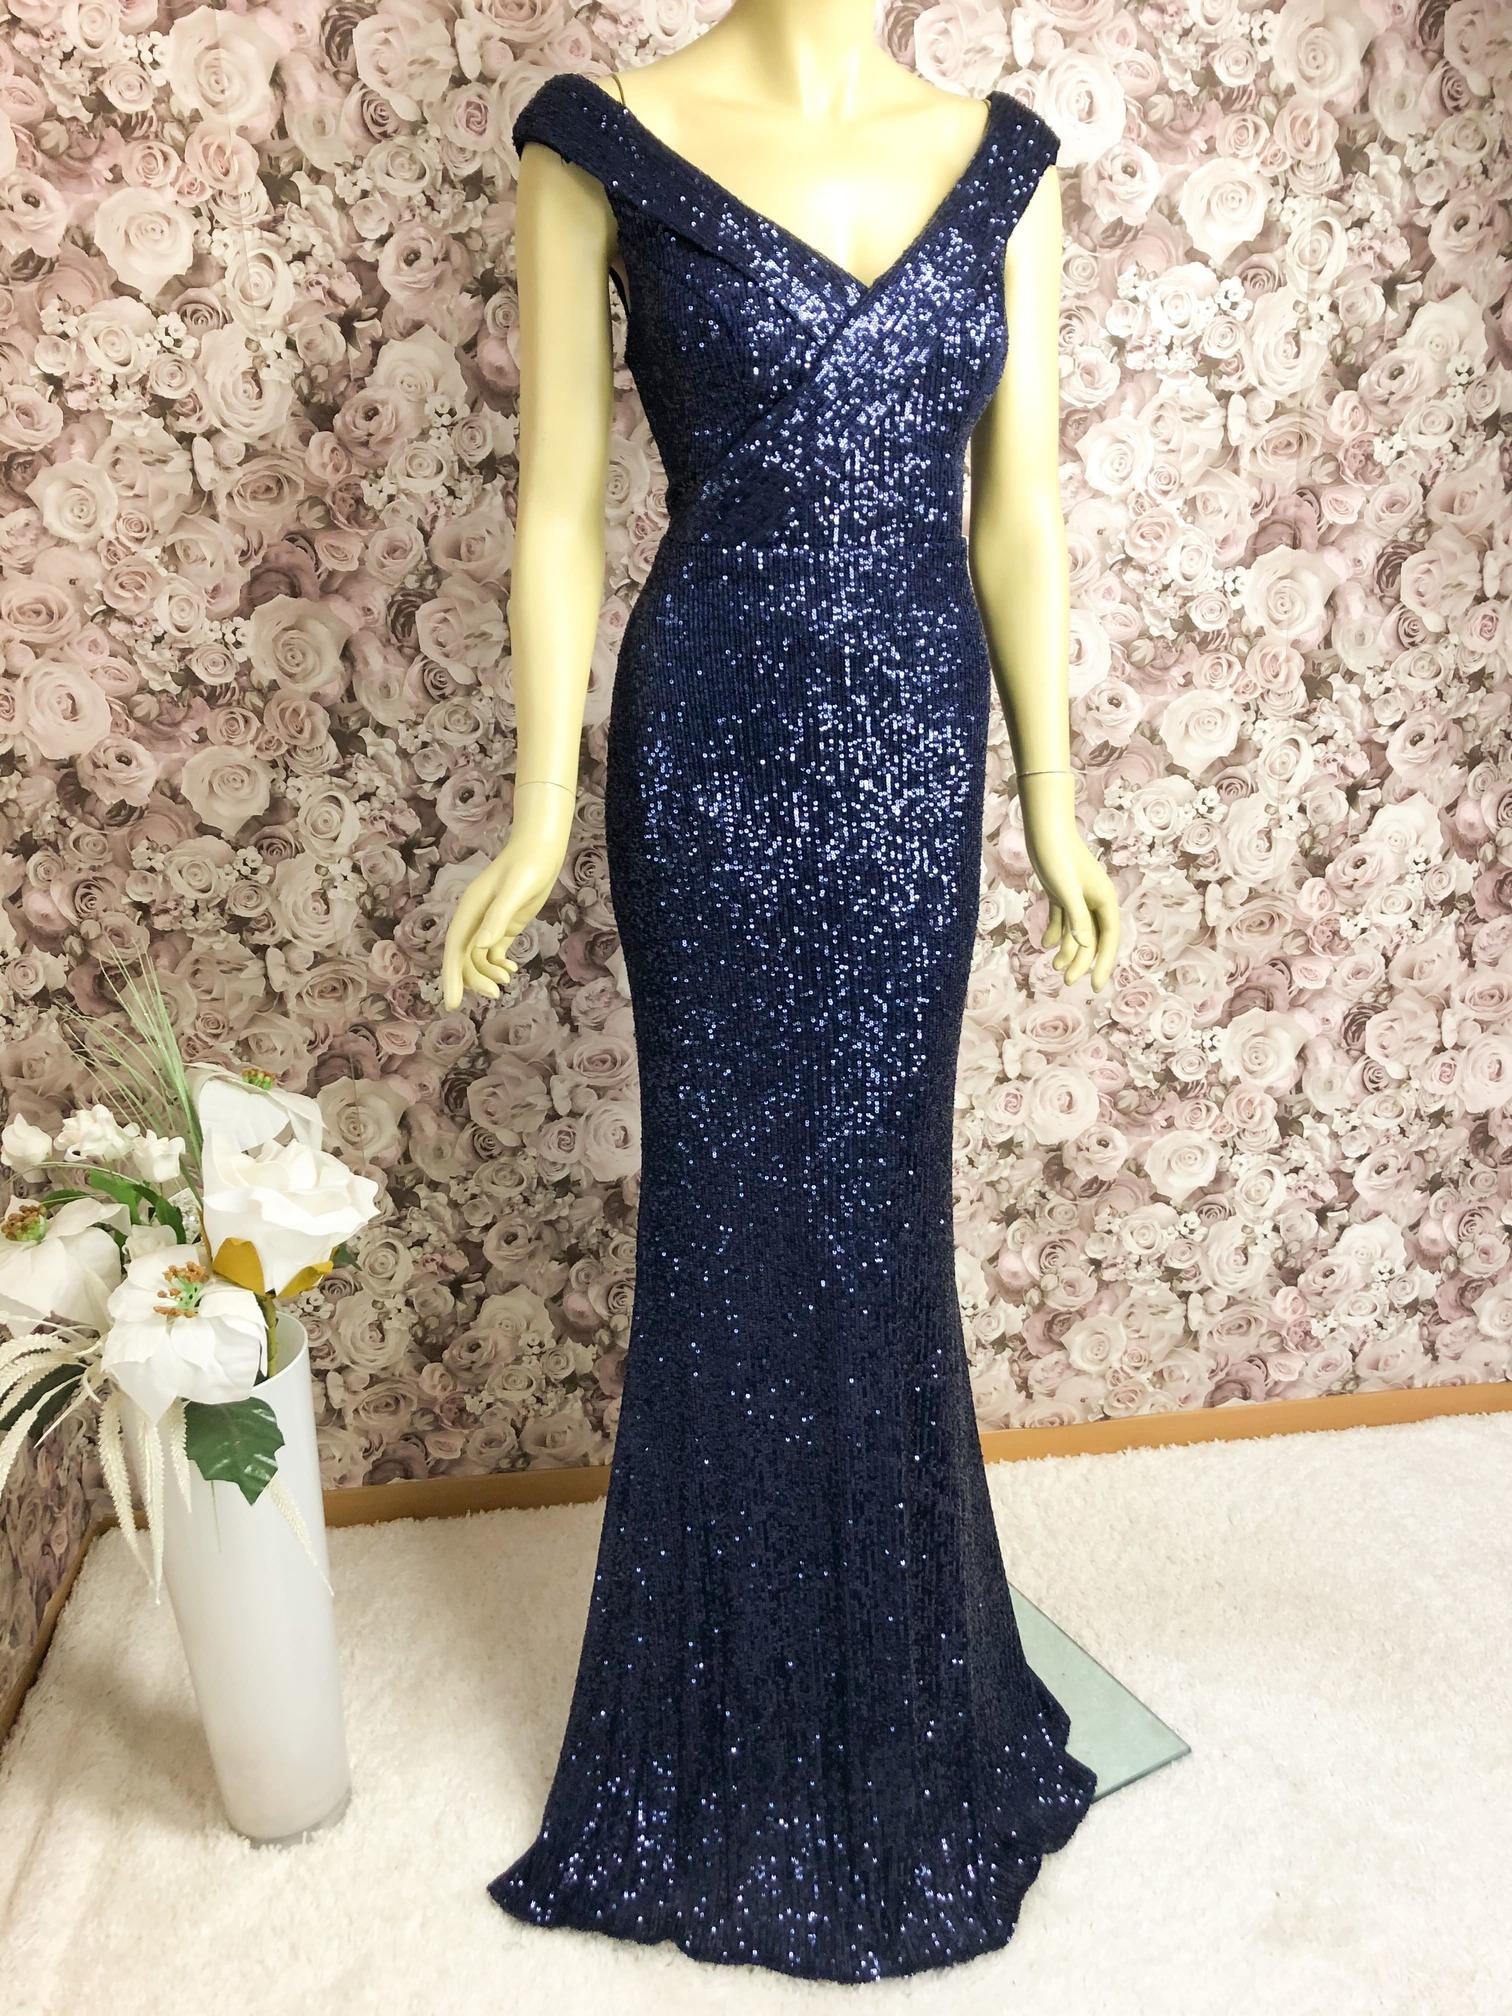 Elegantes Abendkleid Blau ✔ besetzt mit Pailletten✔Blau/Multicolor✔